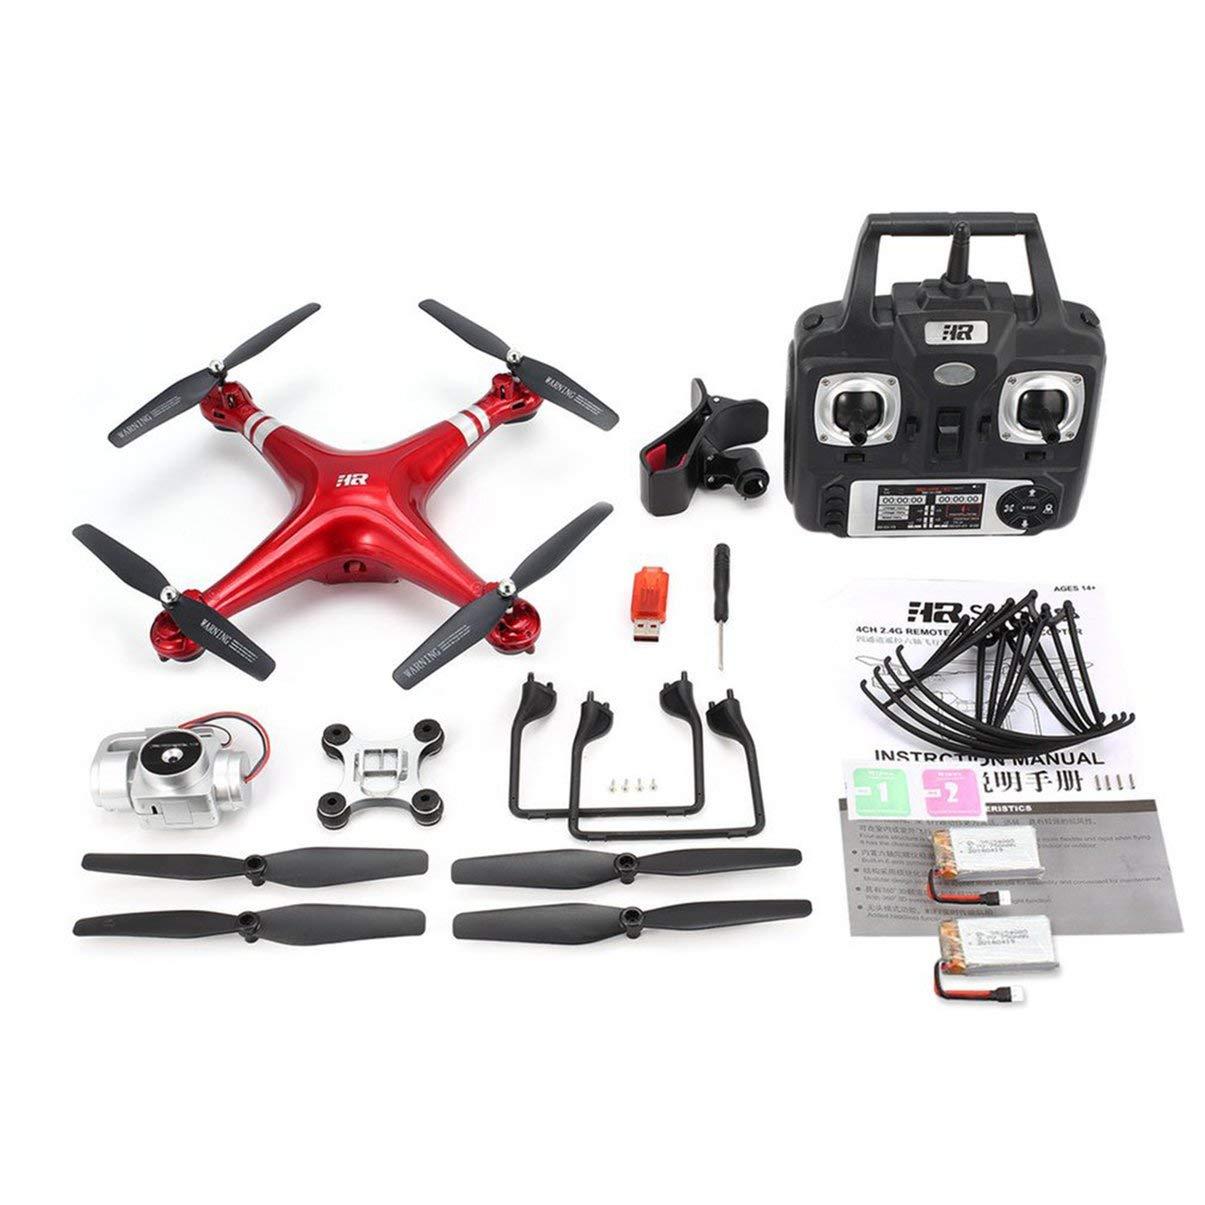 JullyeleDEgant Drohne mit Kamera HD 720P Mini FPV RC Quadrocopter Drohne One Key Start/Landung